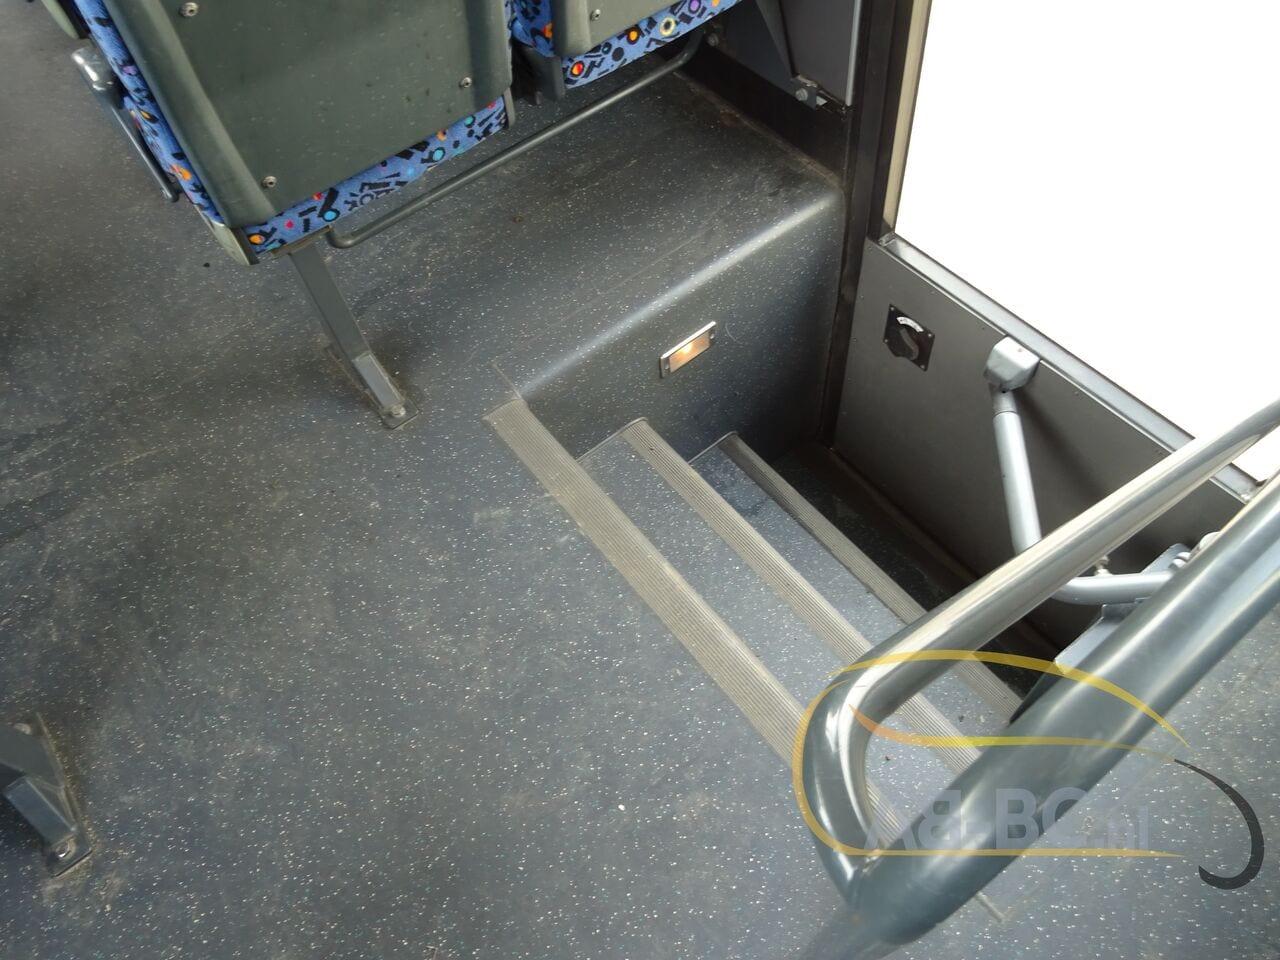 interurban-busMAN-Fast-64-seats---1619620048011477620_big_8aef1ed82472e3a127db82315694c082--21042817163019598600